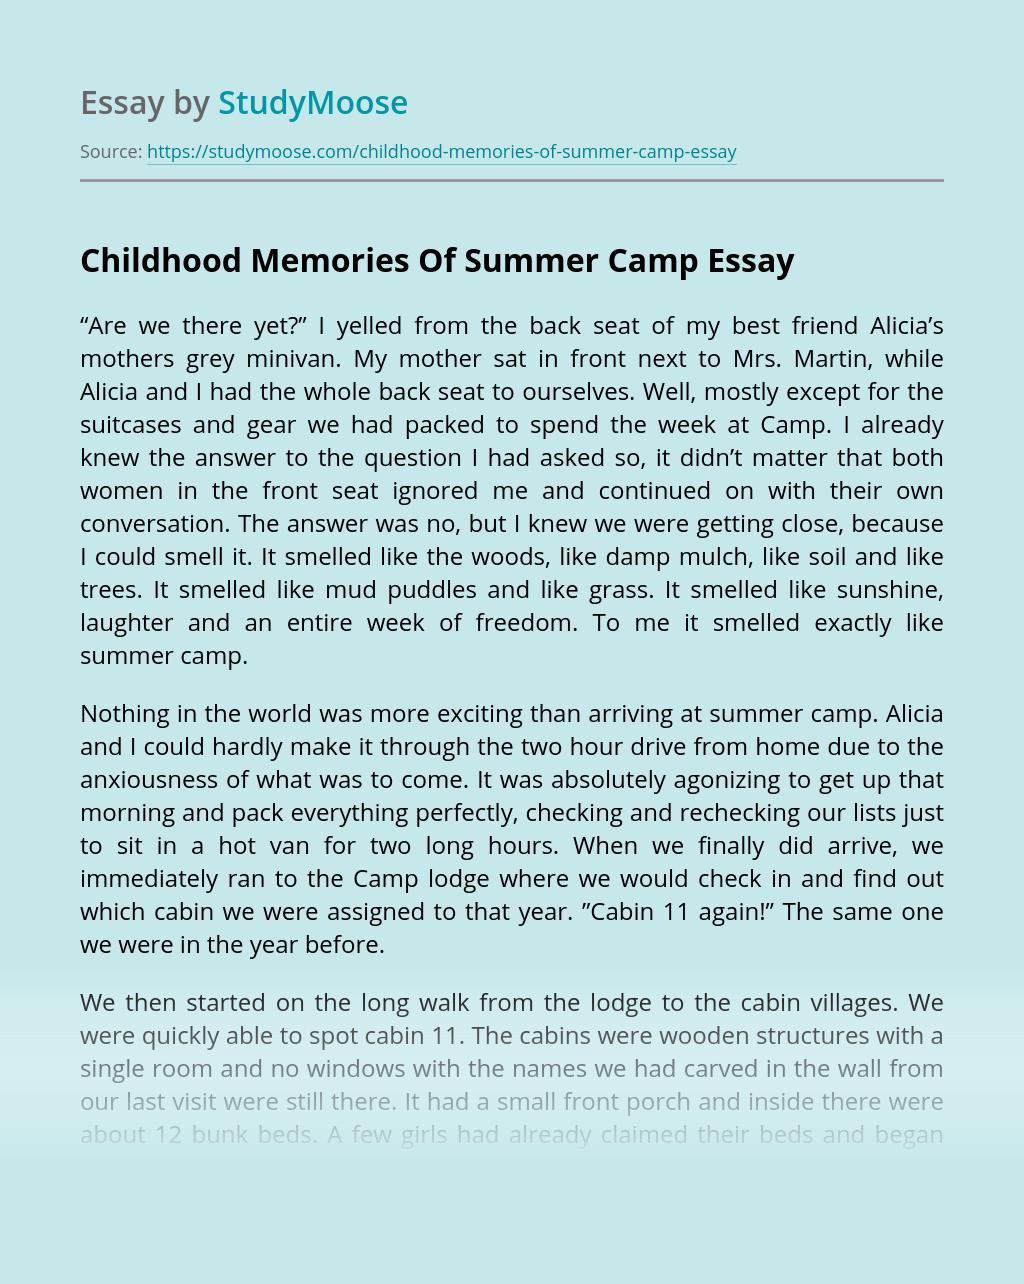 Childhood Memories Of Summer Camp